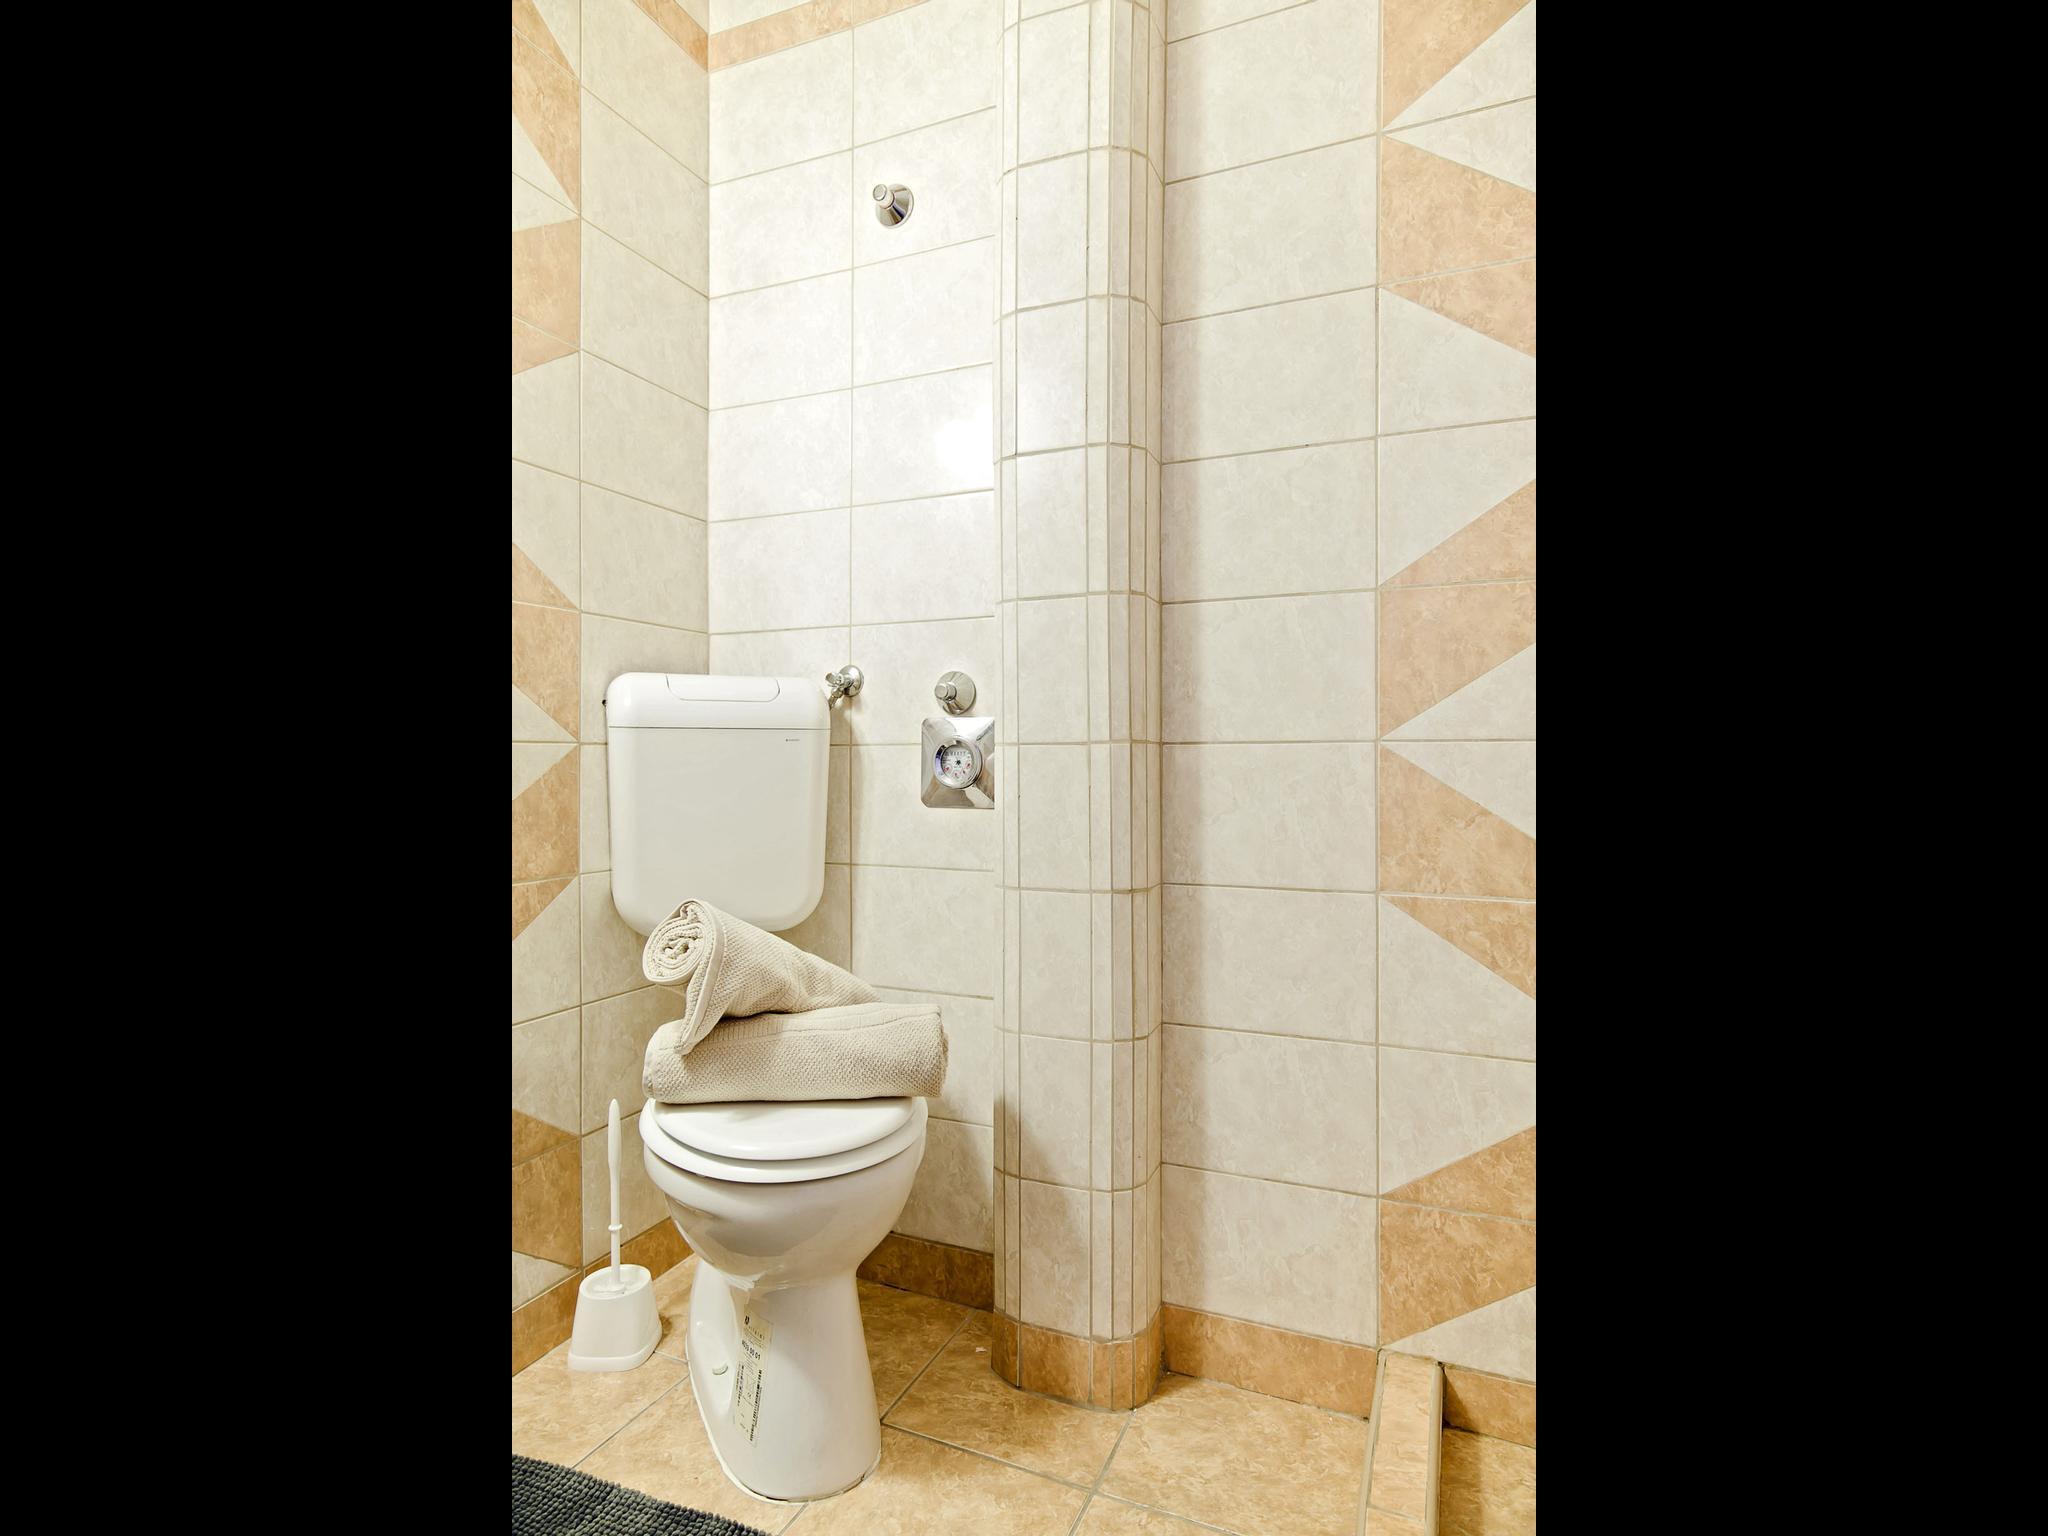 Rakoczi 2 - Private bedroom flat Budapest